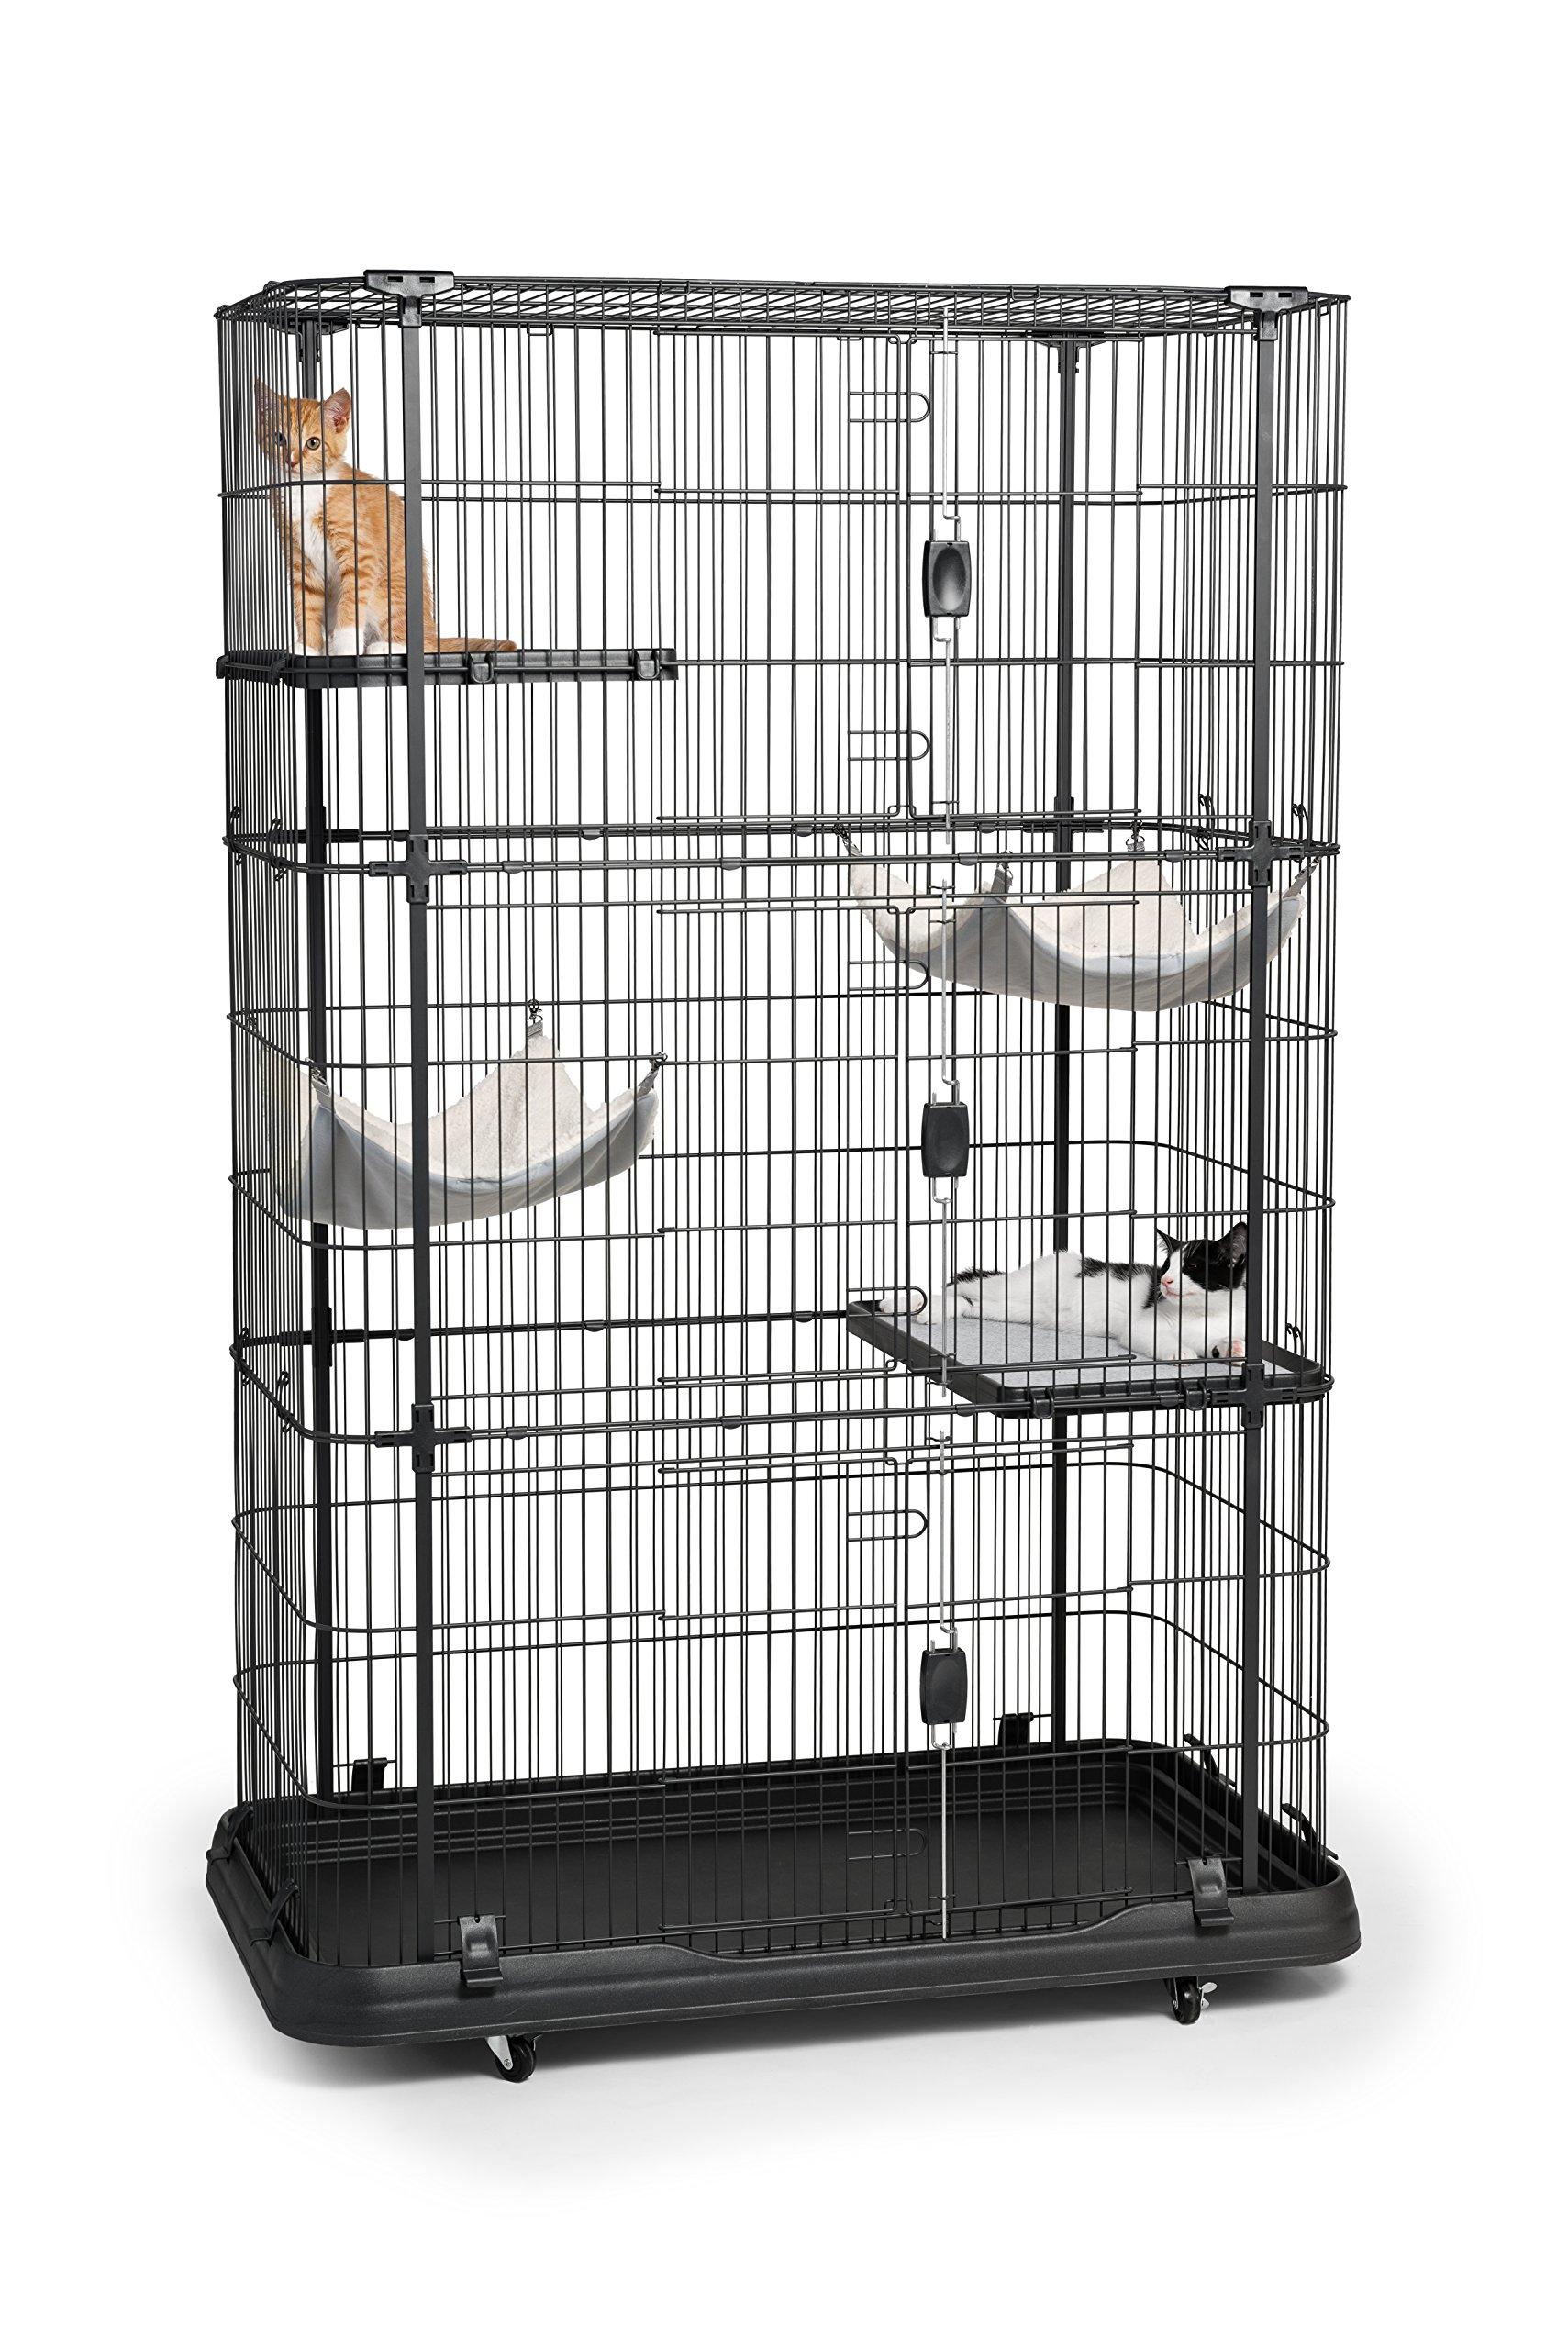 Prevue Pet Products 7500 Premium Cat Home with 4 Levels, Black